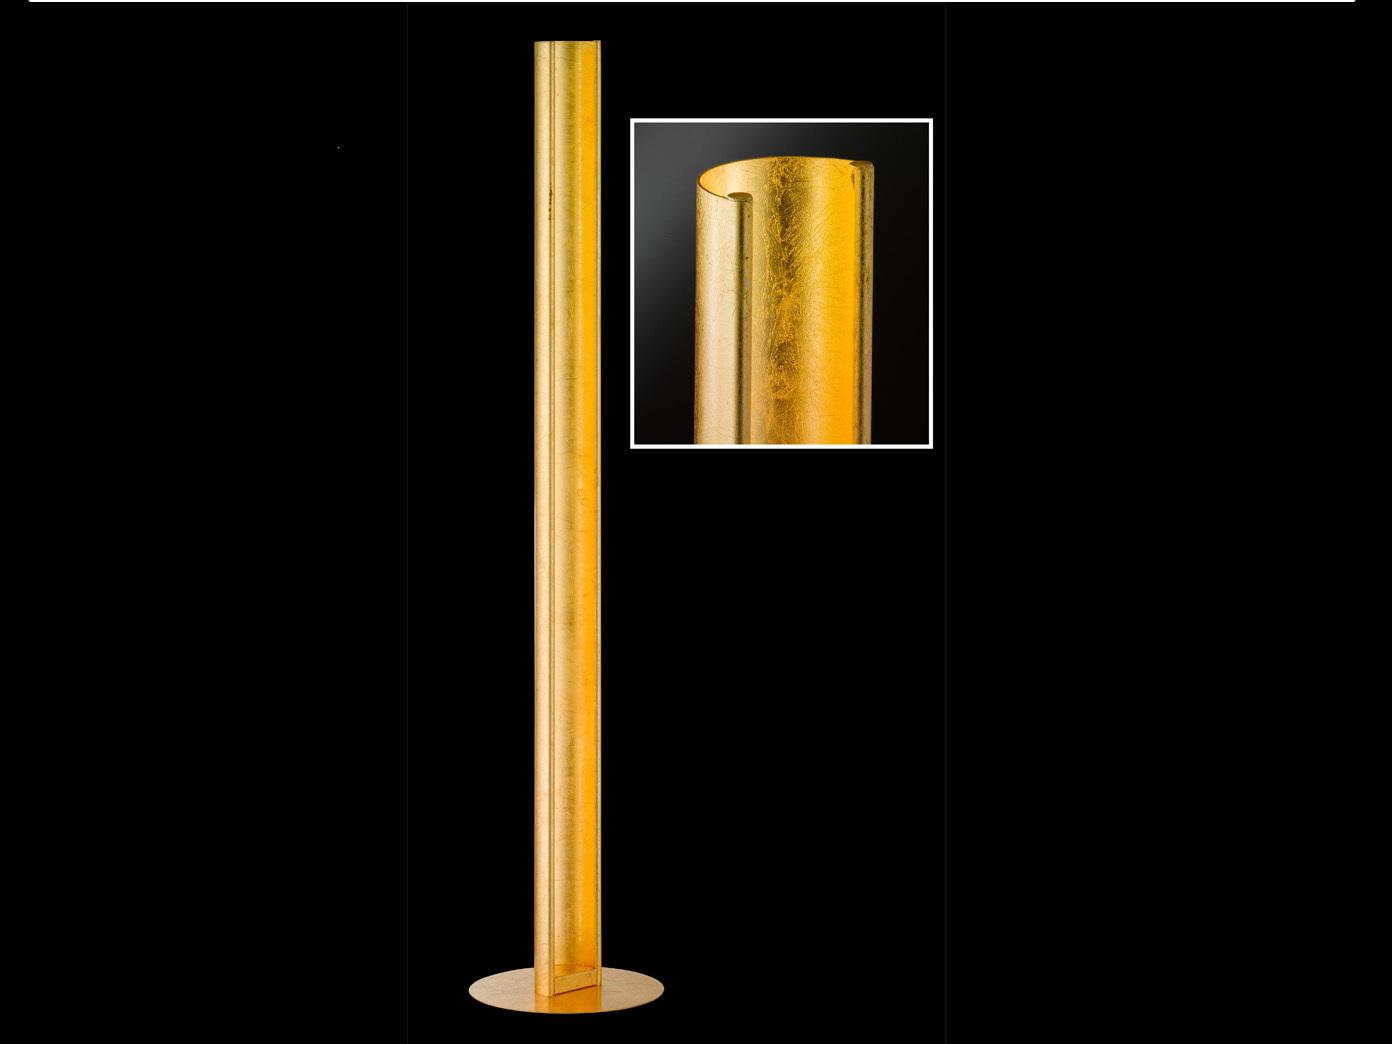 Fabelhaft Led Stehlampe Dimmbar Foto Von Designerlampe-led-stehlampe-dimmbar-hoehe-126cm-gold-standlampe-